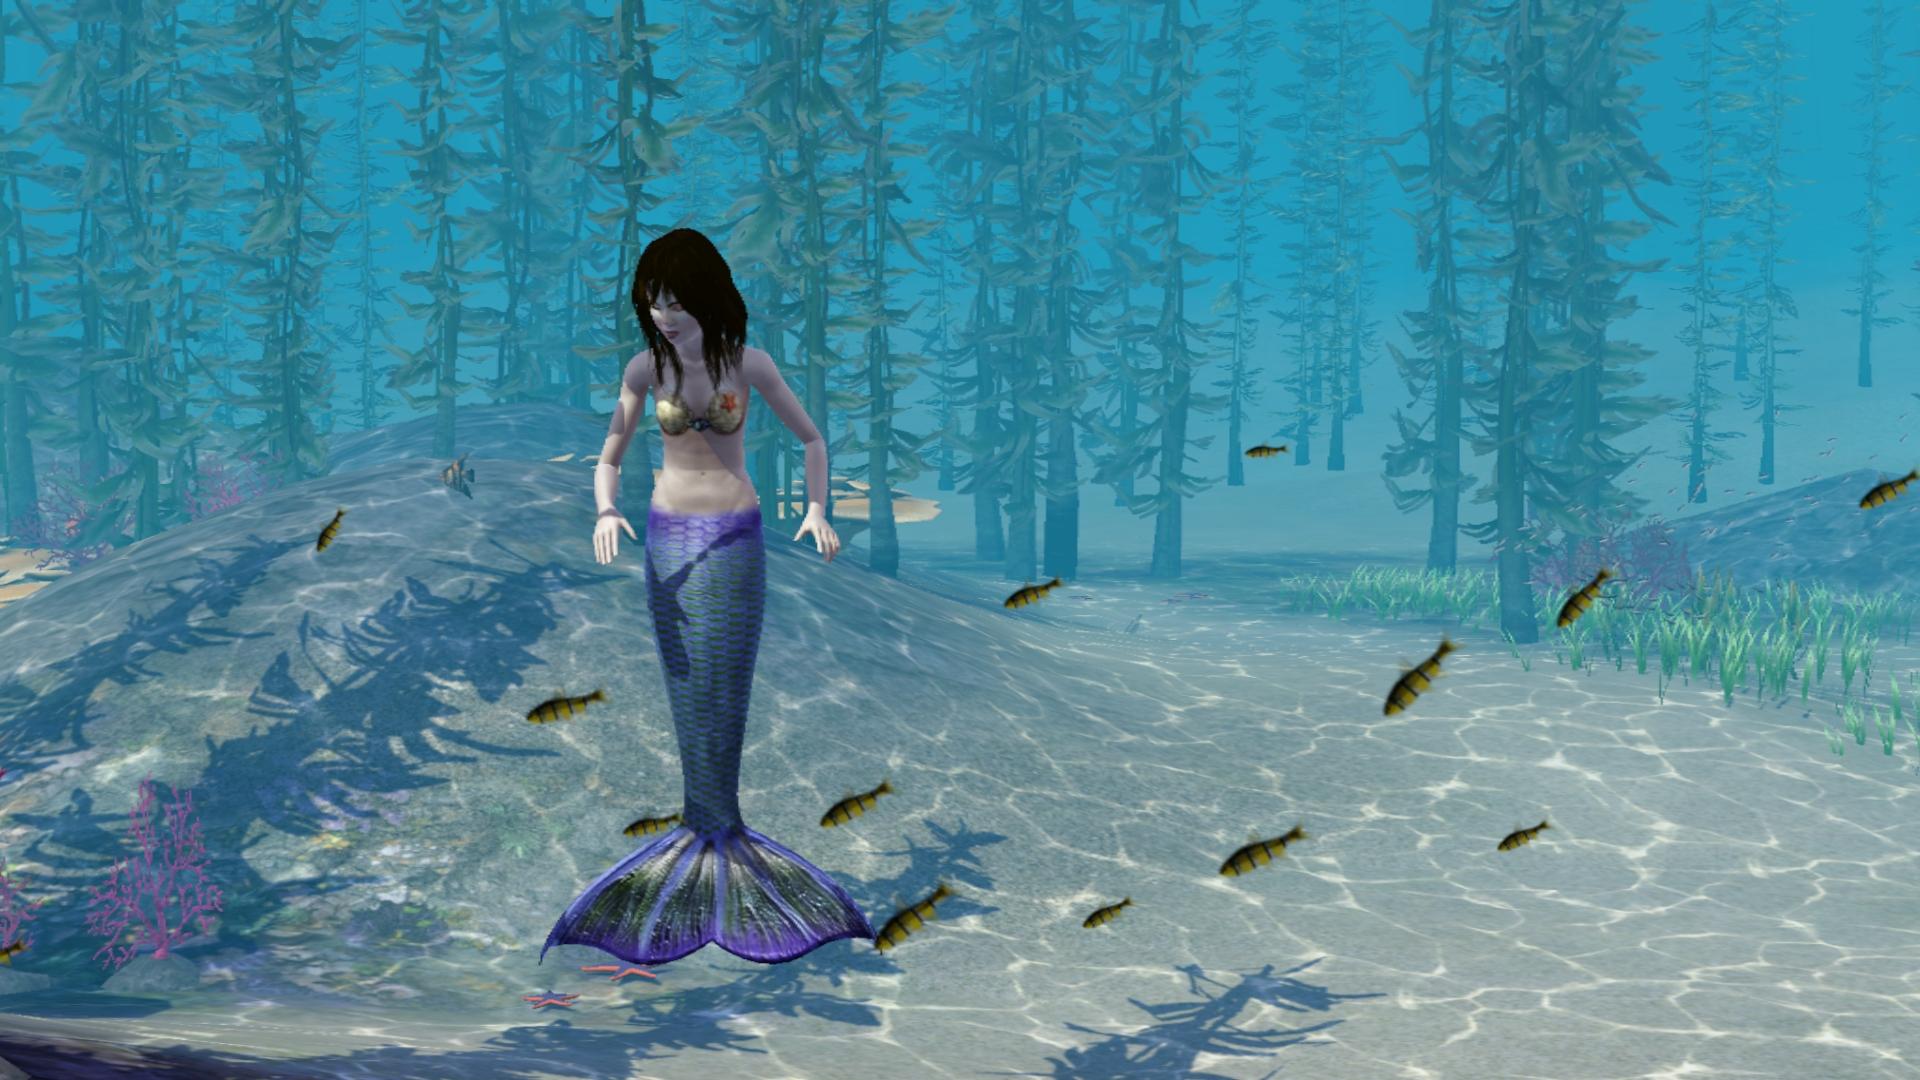 Sims 3 как играть на стакане - 4